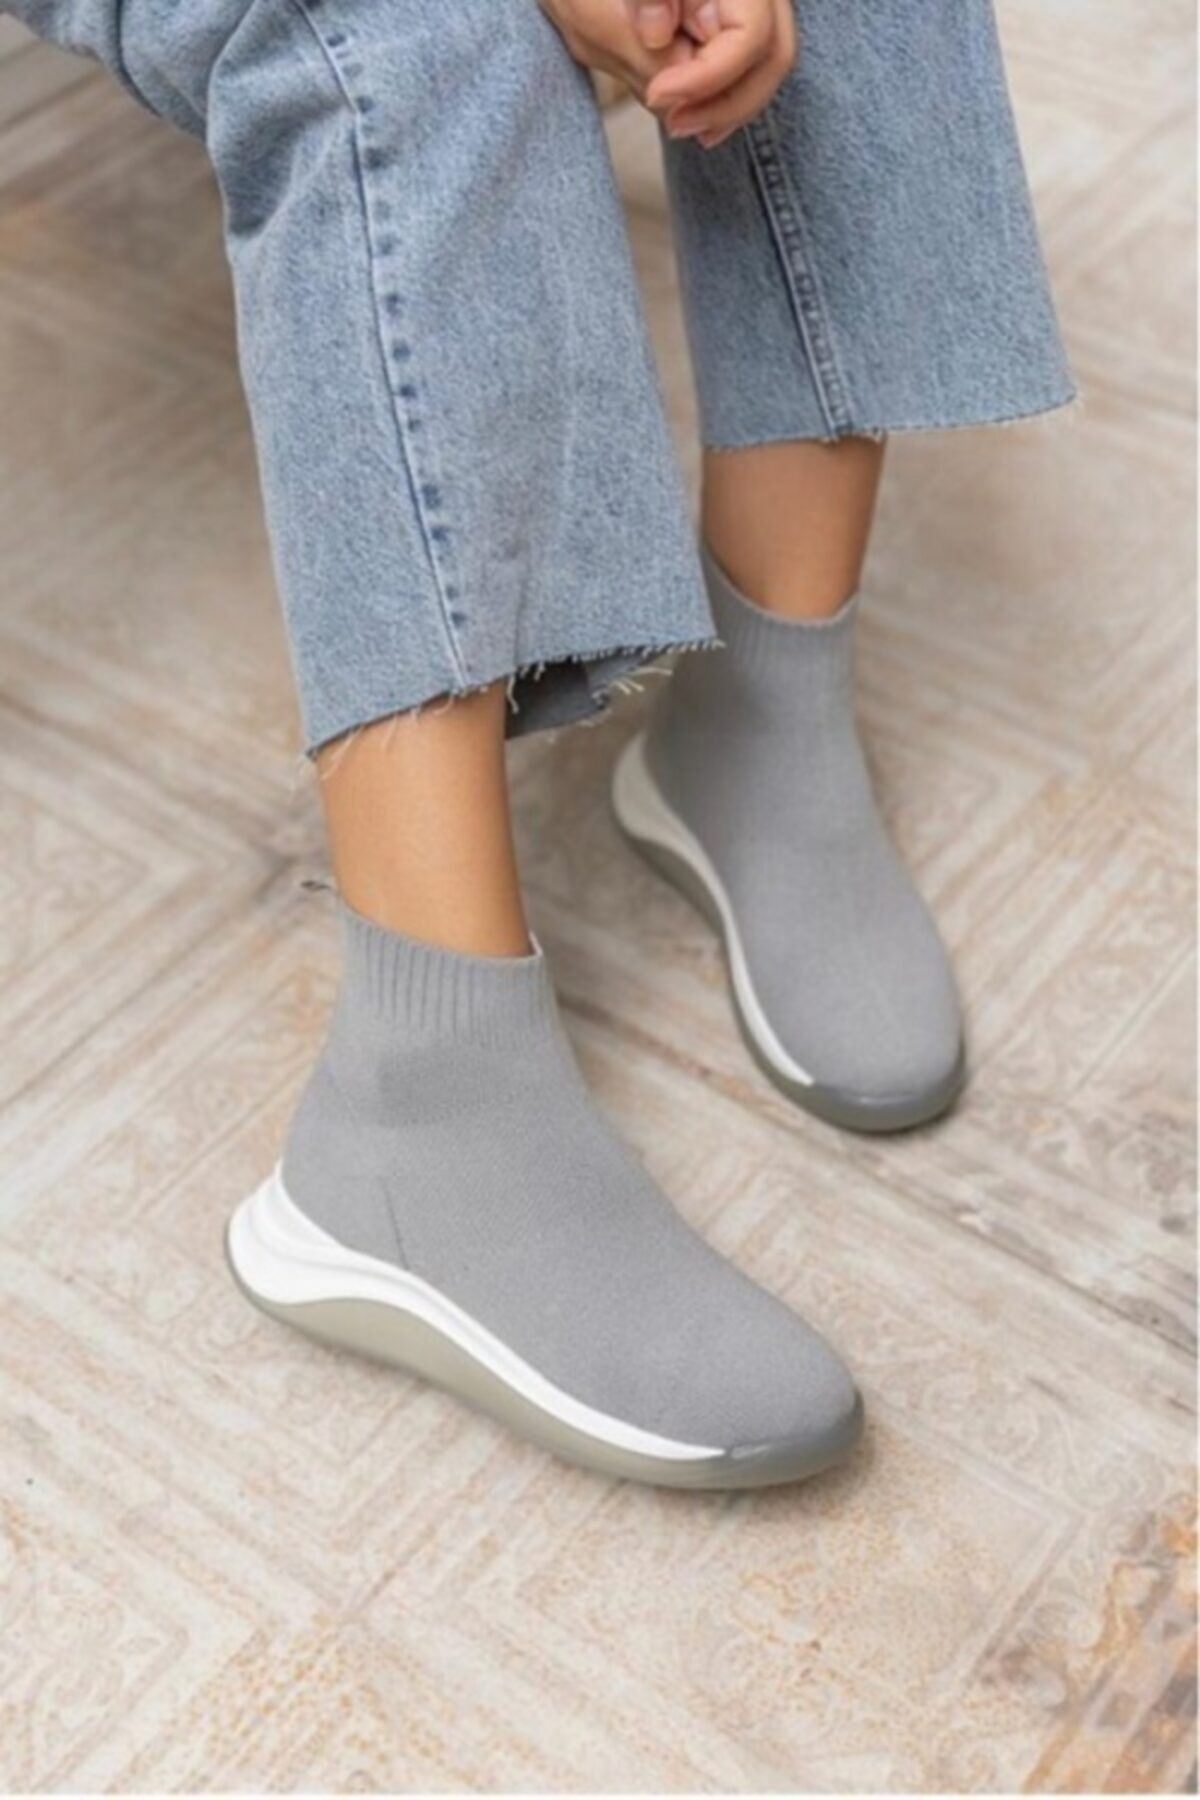 KİMİYA71 SHOES Kimiya71 Kadın Streç Triko Bot / Çorap Bot 2